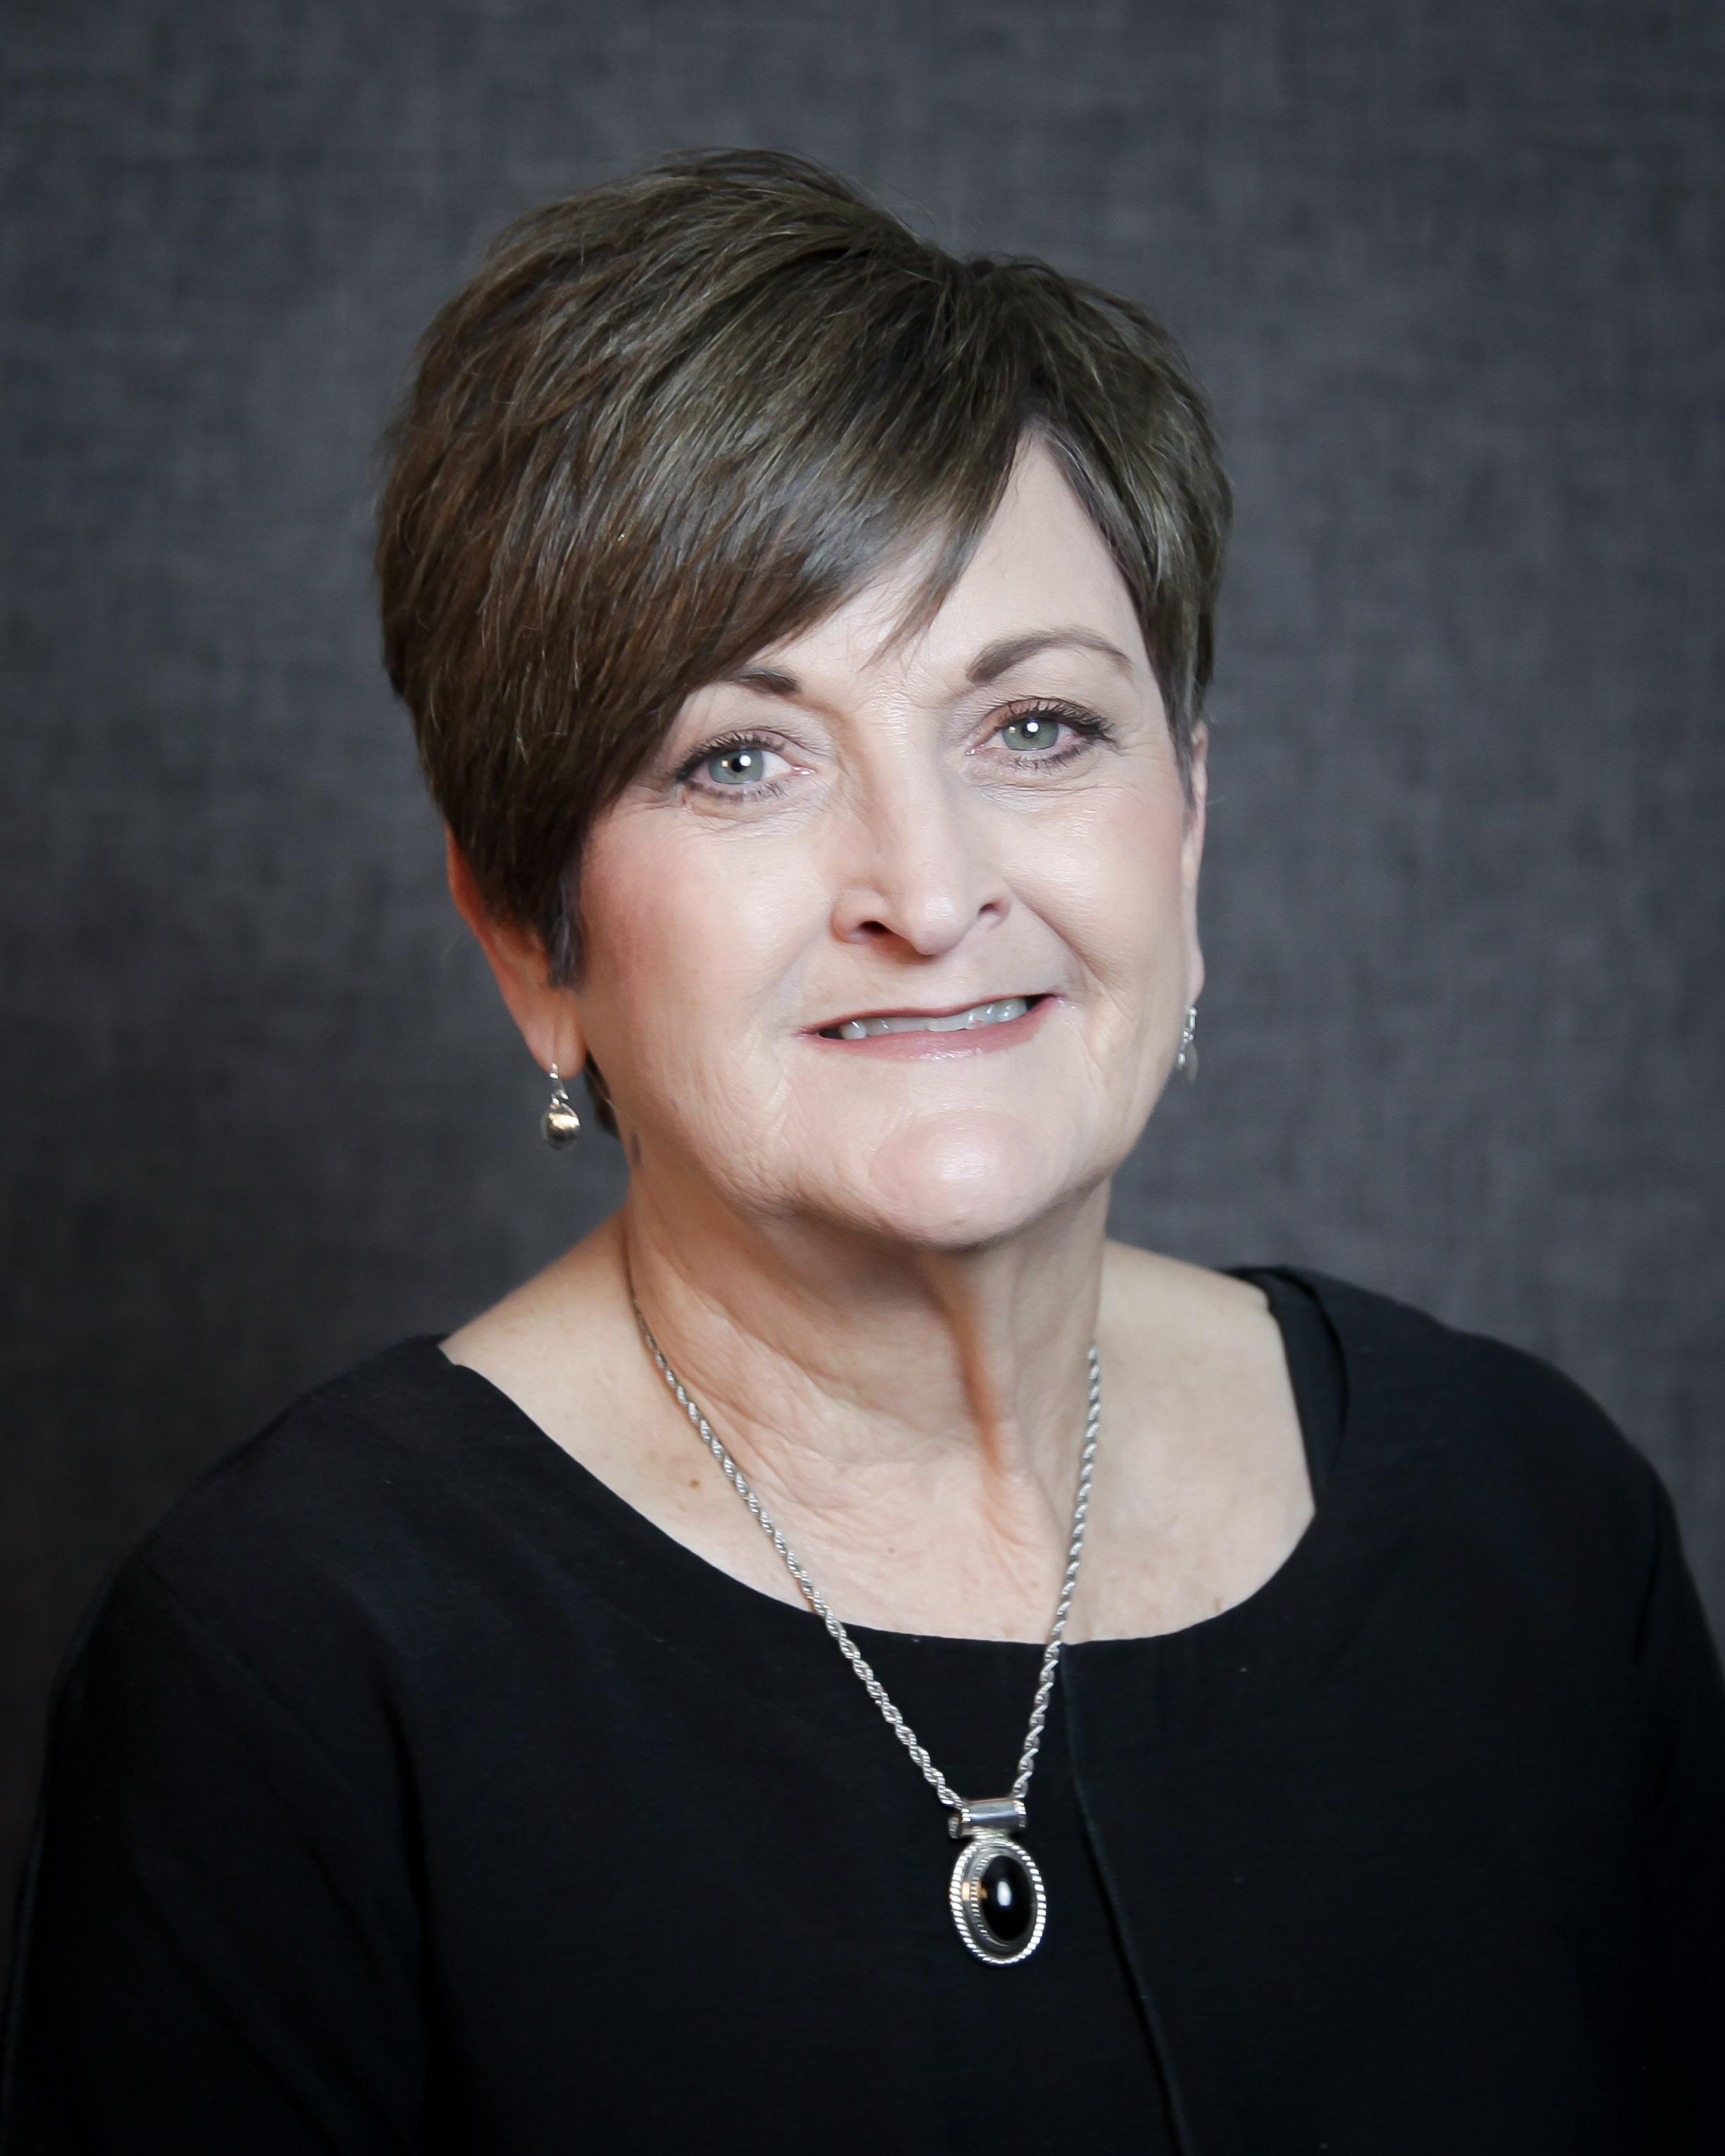 Debbie Mattingley